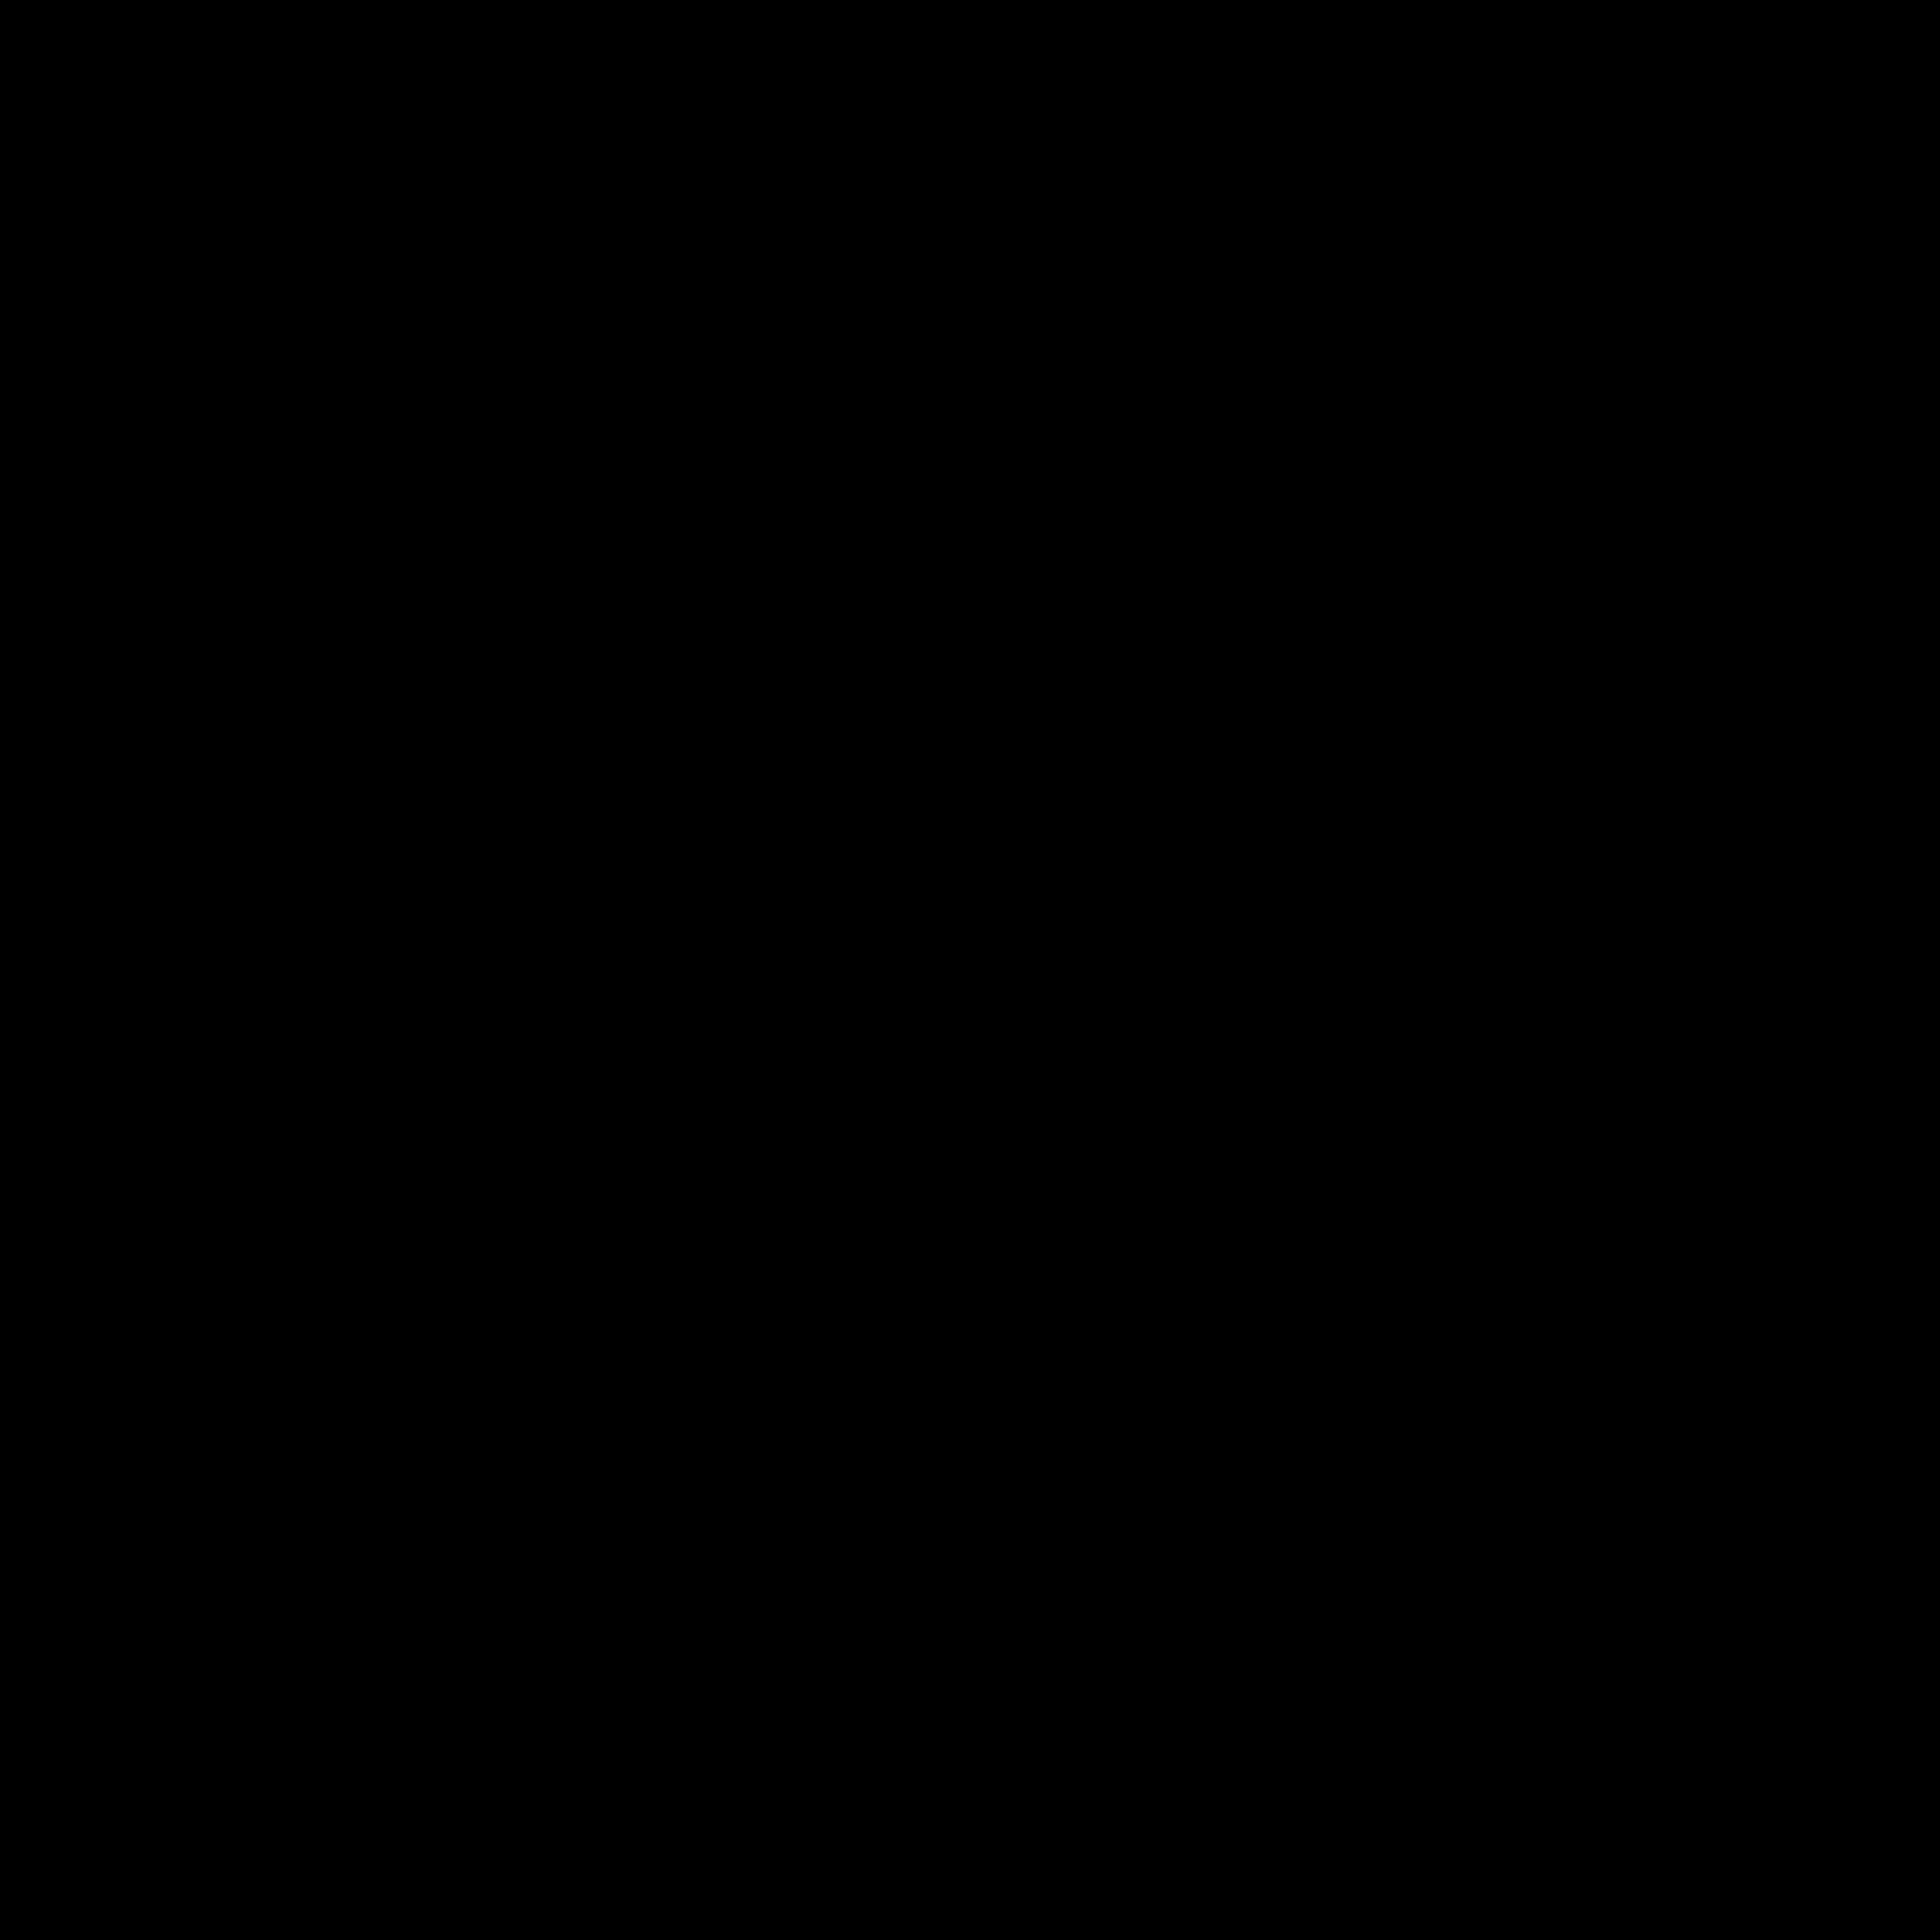 Sun Clip Art Outline - Sunshine Emoji Black And White